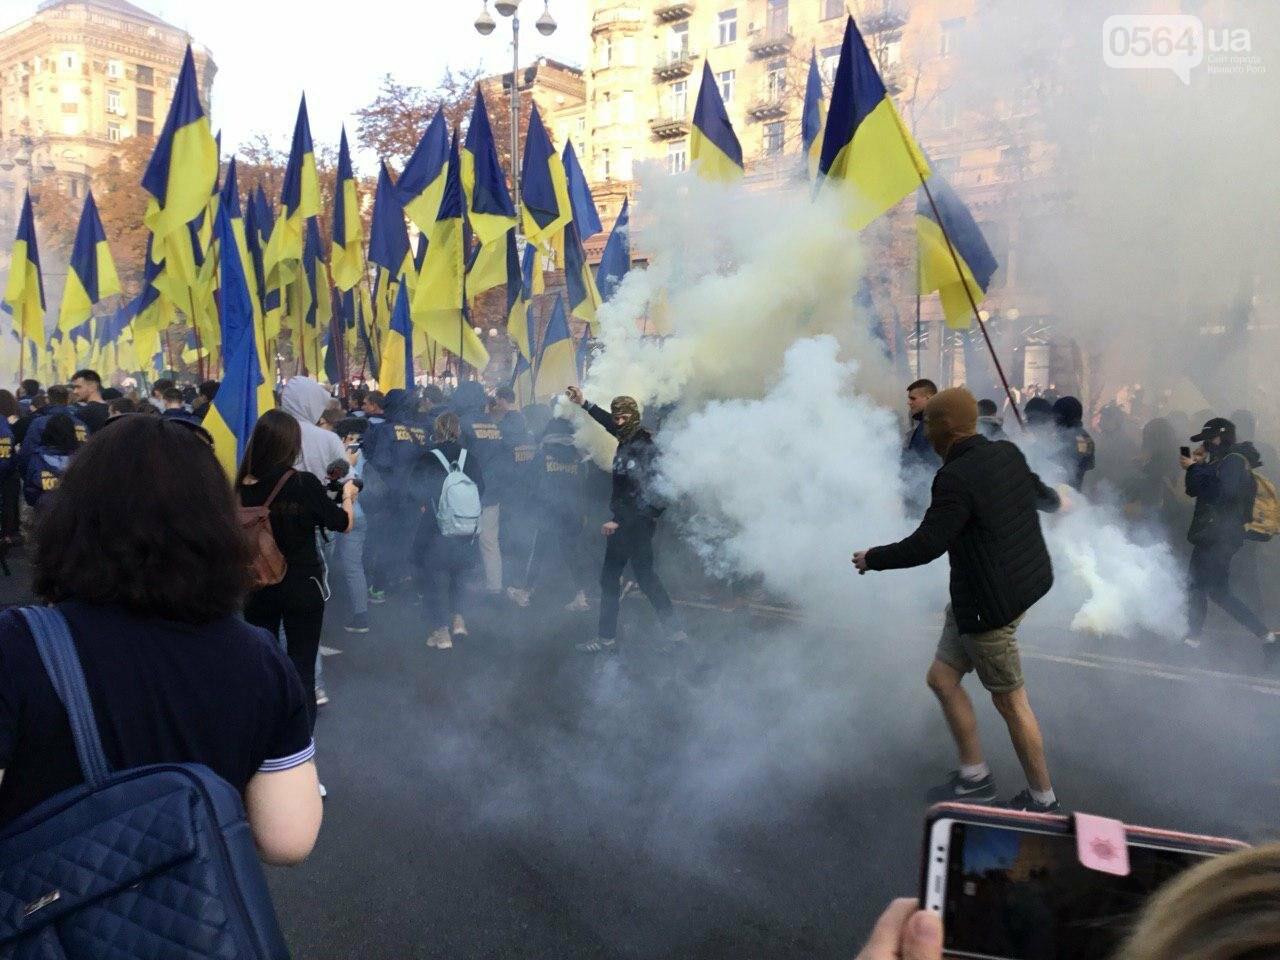 Криворожане поддержали Марш сопротивления капитуляции в Киеве, - ФОТО, ВИДЕО, ОБНОВЛЕНО, фото-5